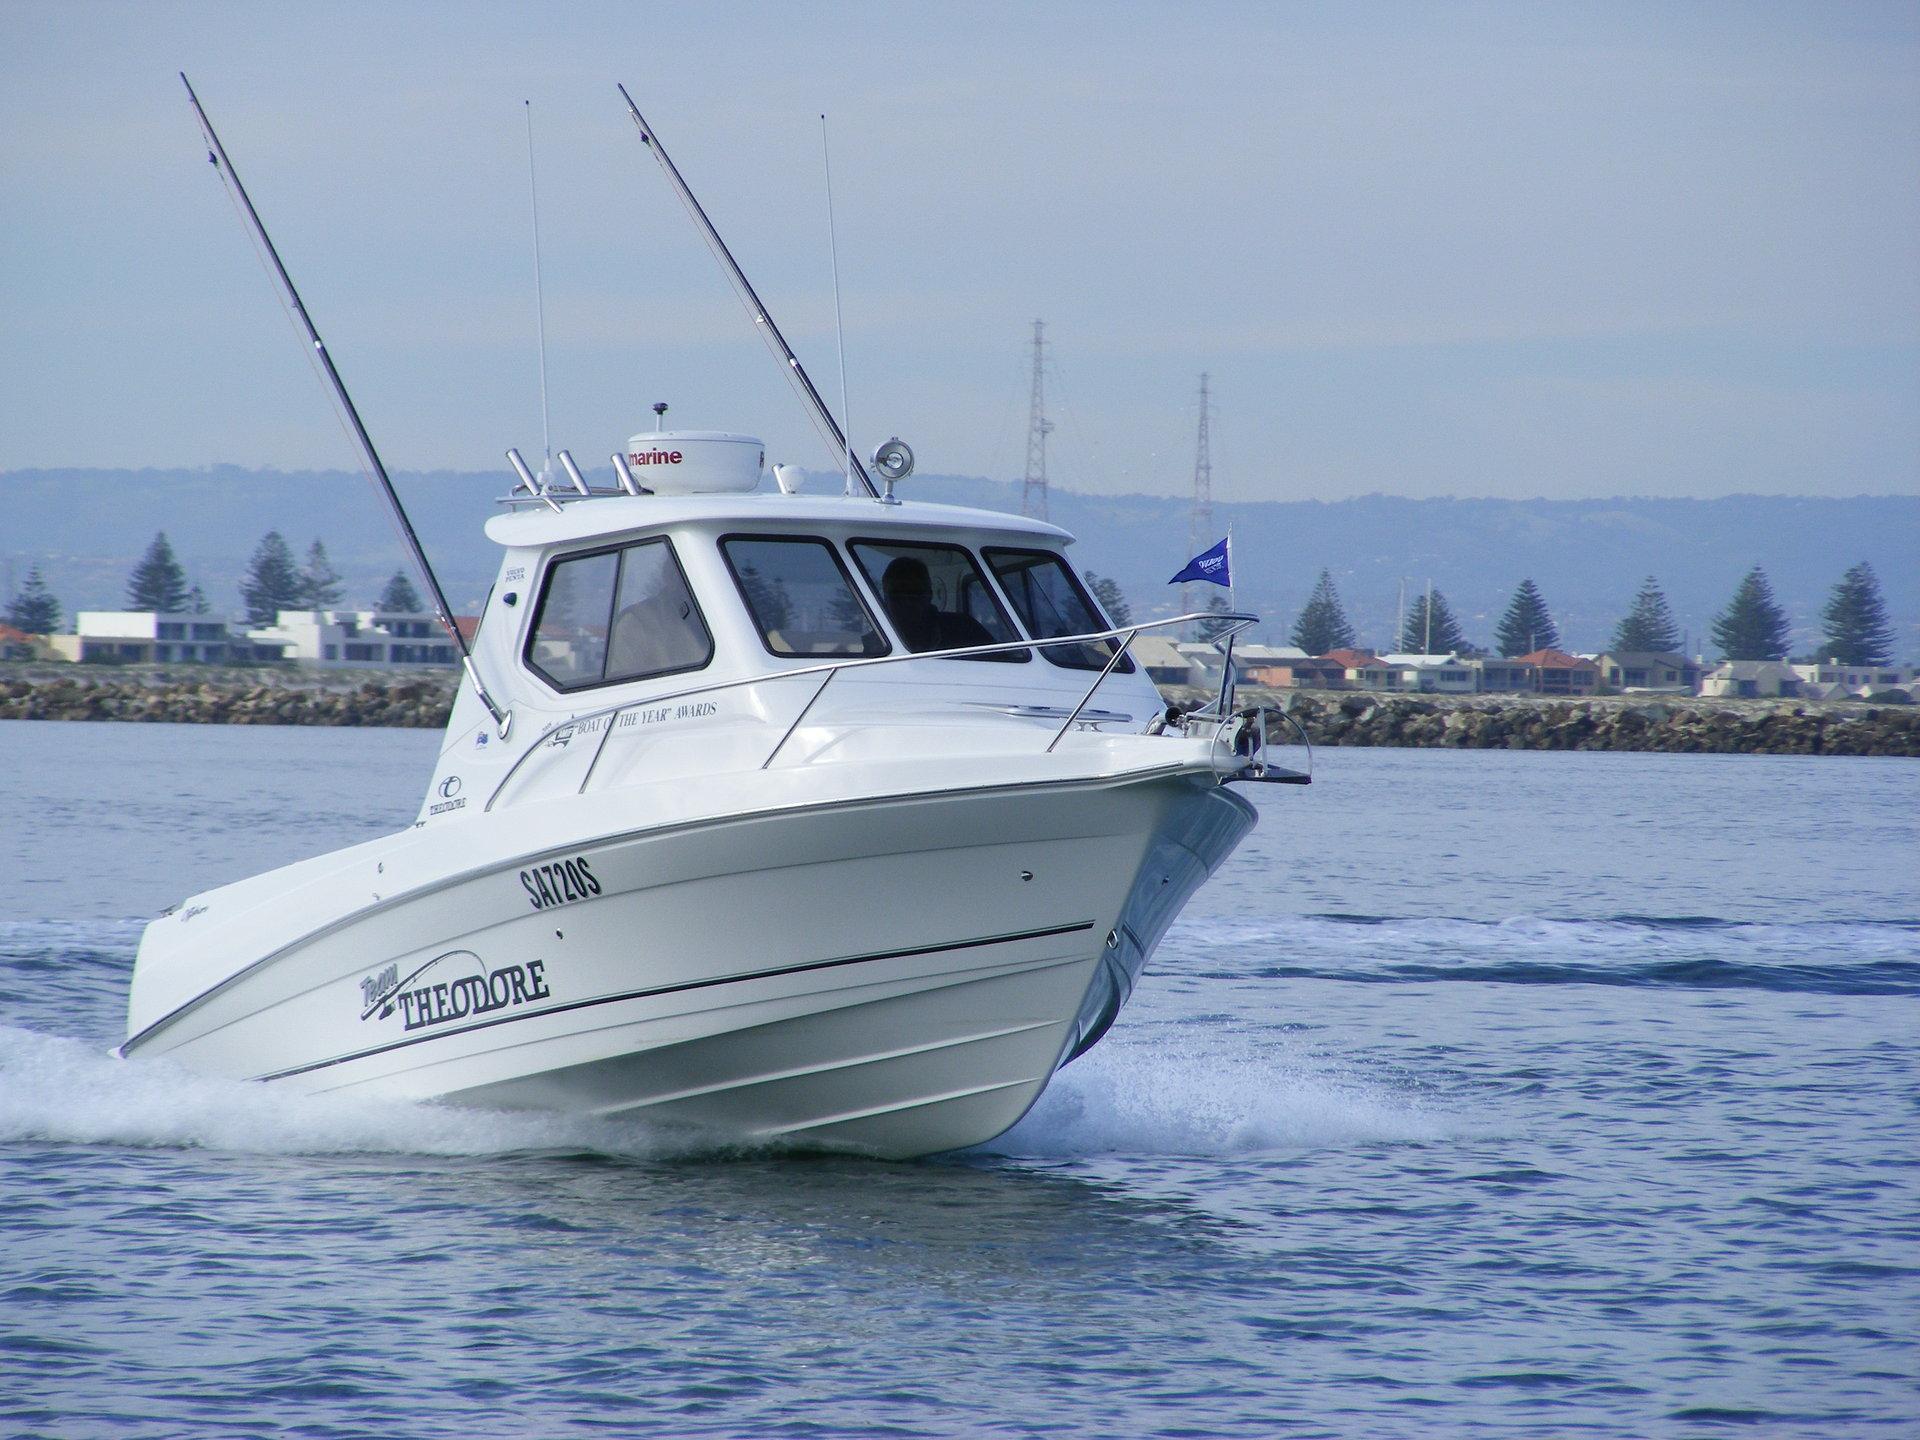 Theodore 720 Offshore 1